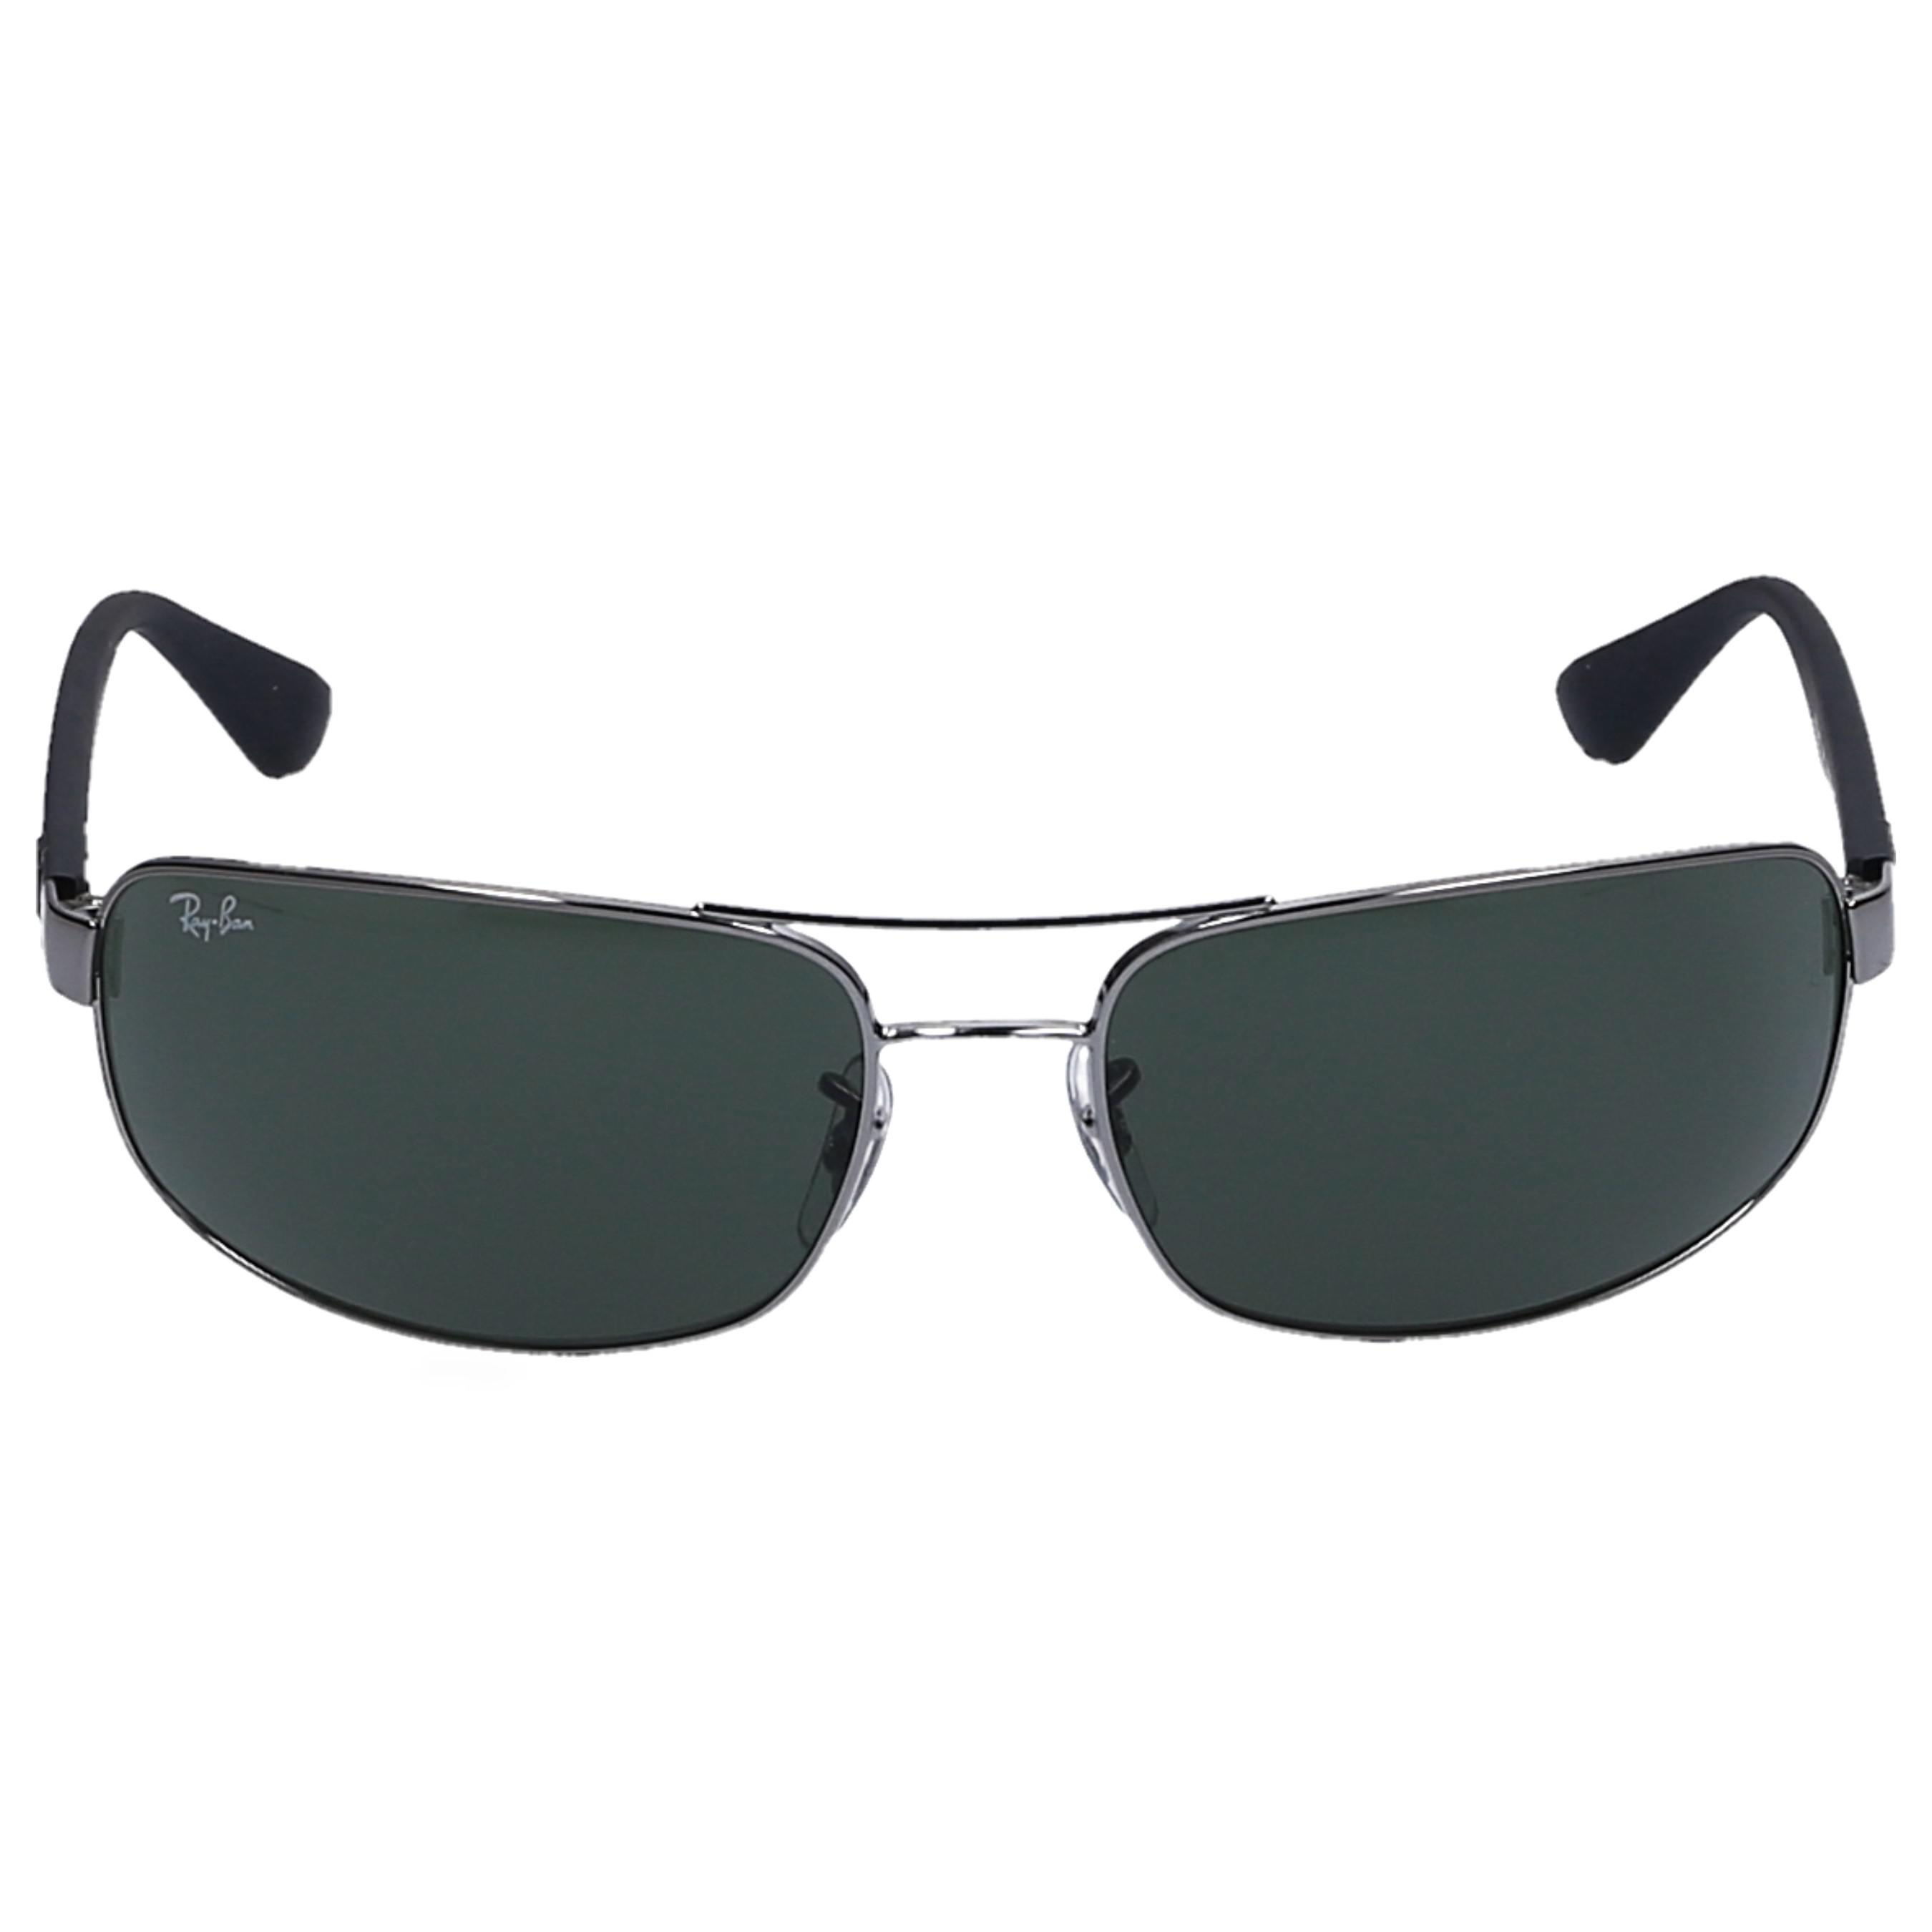 e763974511 Lyst - Ray-Ban Sunglasses Aviator 3445 Acetate Black in Black for Men